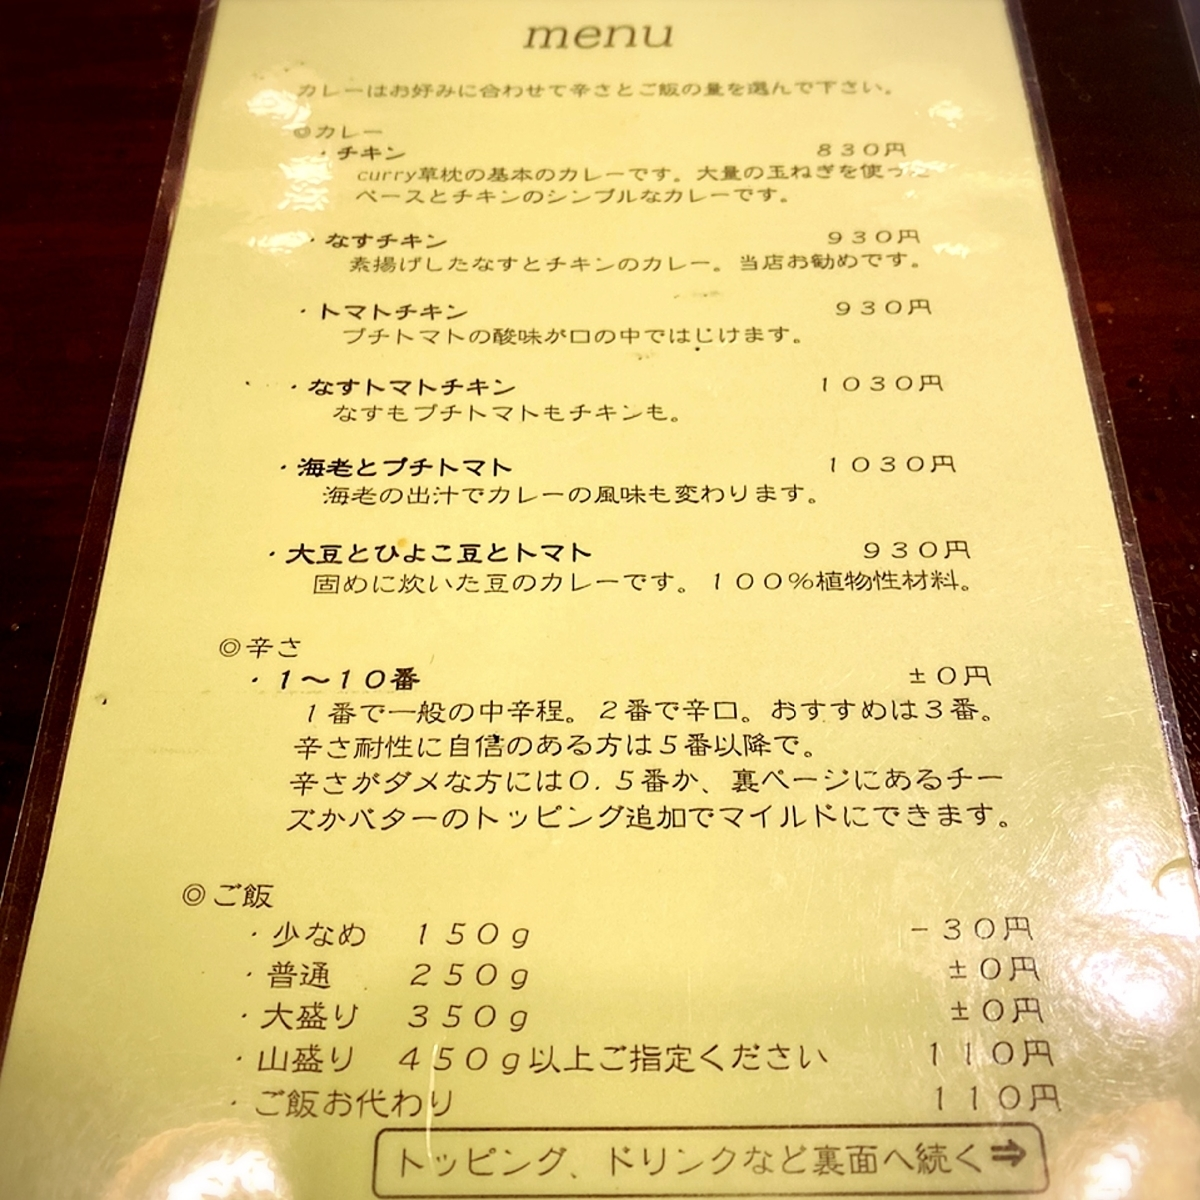 「curry 草枕」のメニューと値段1